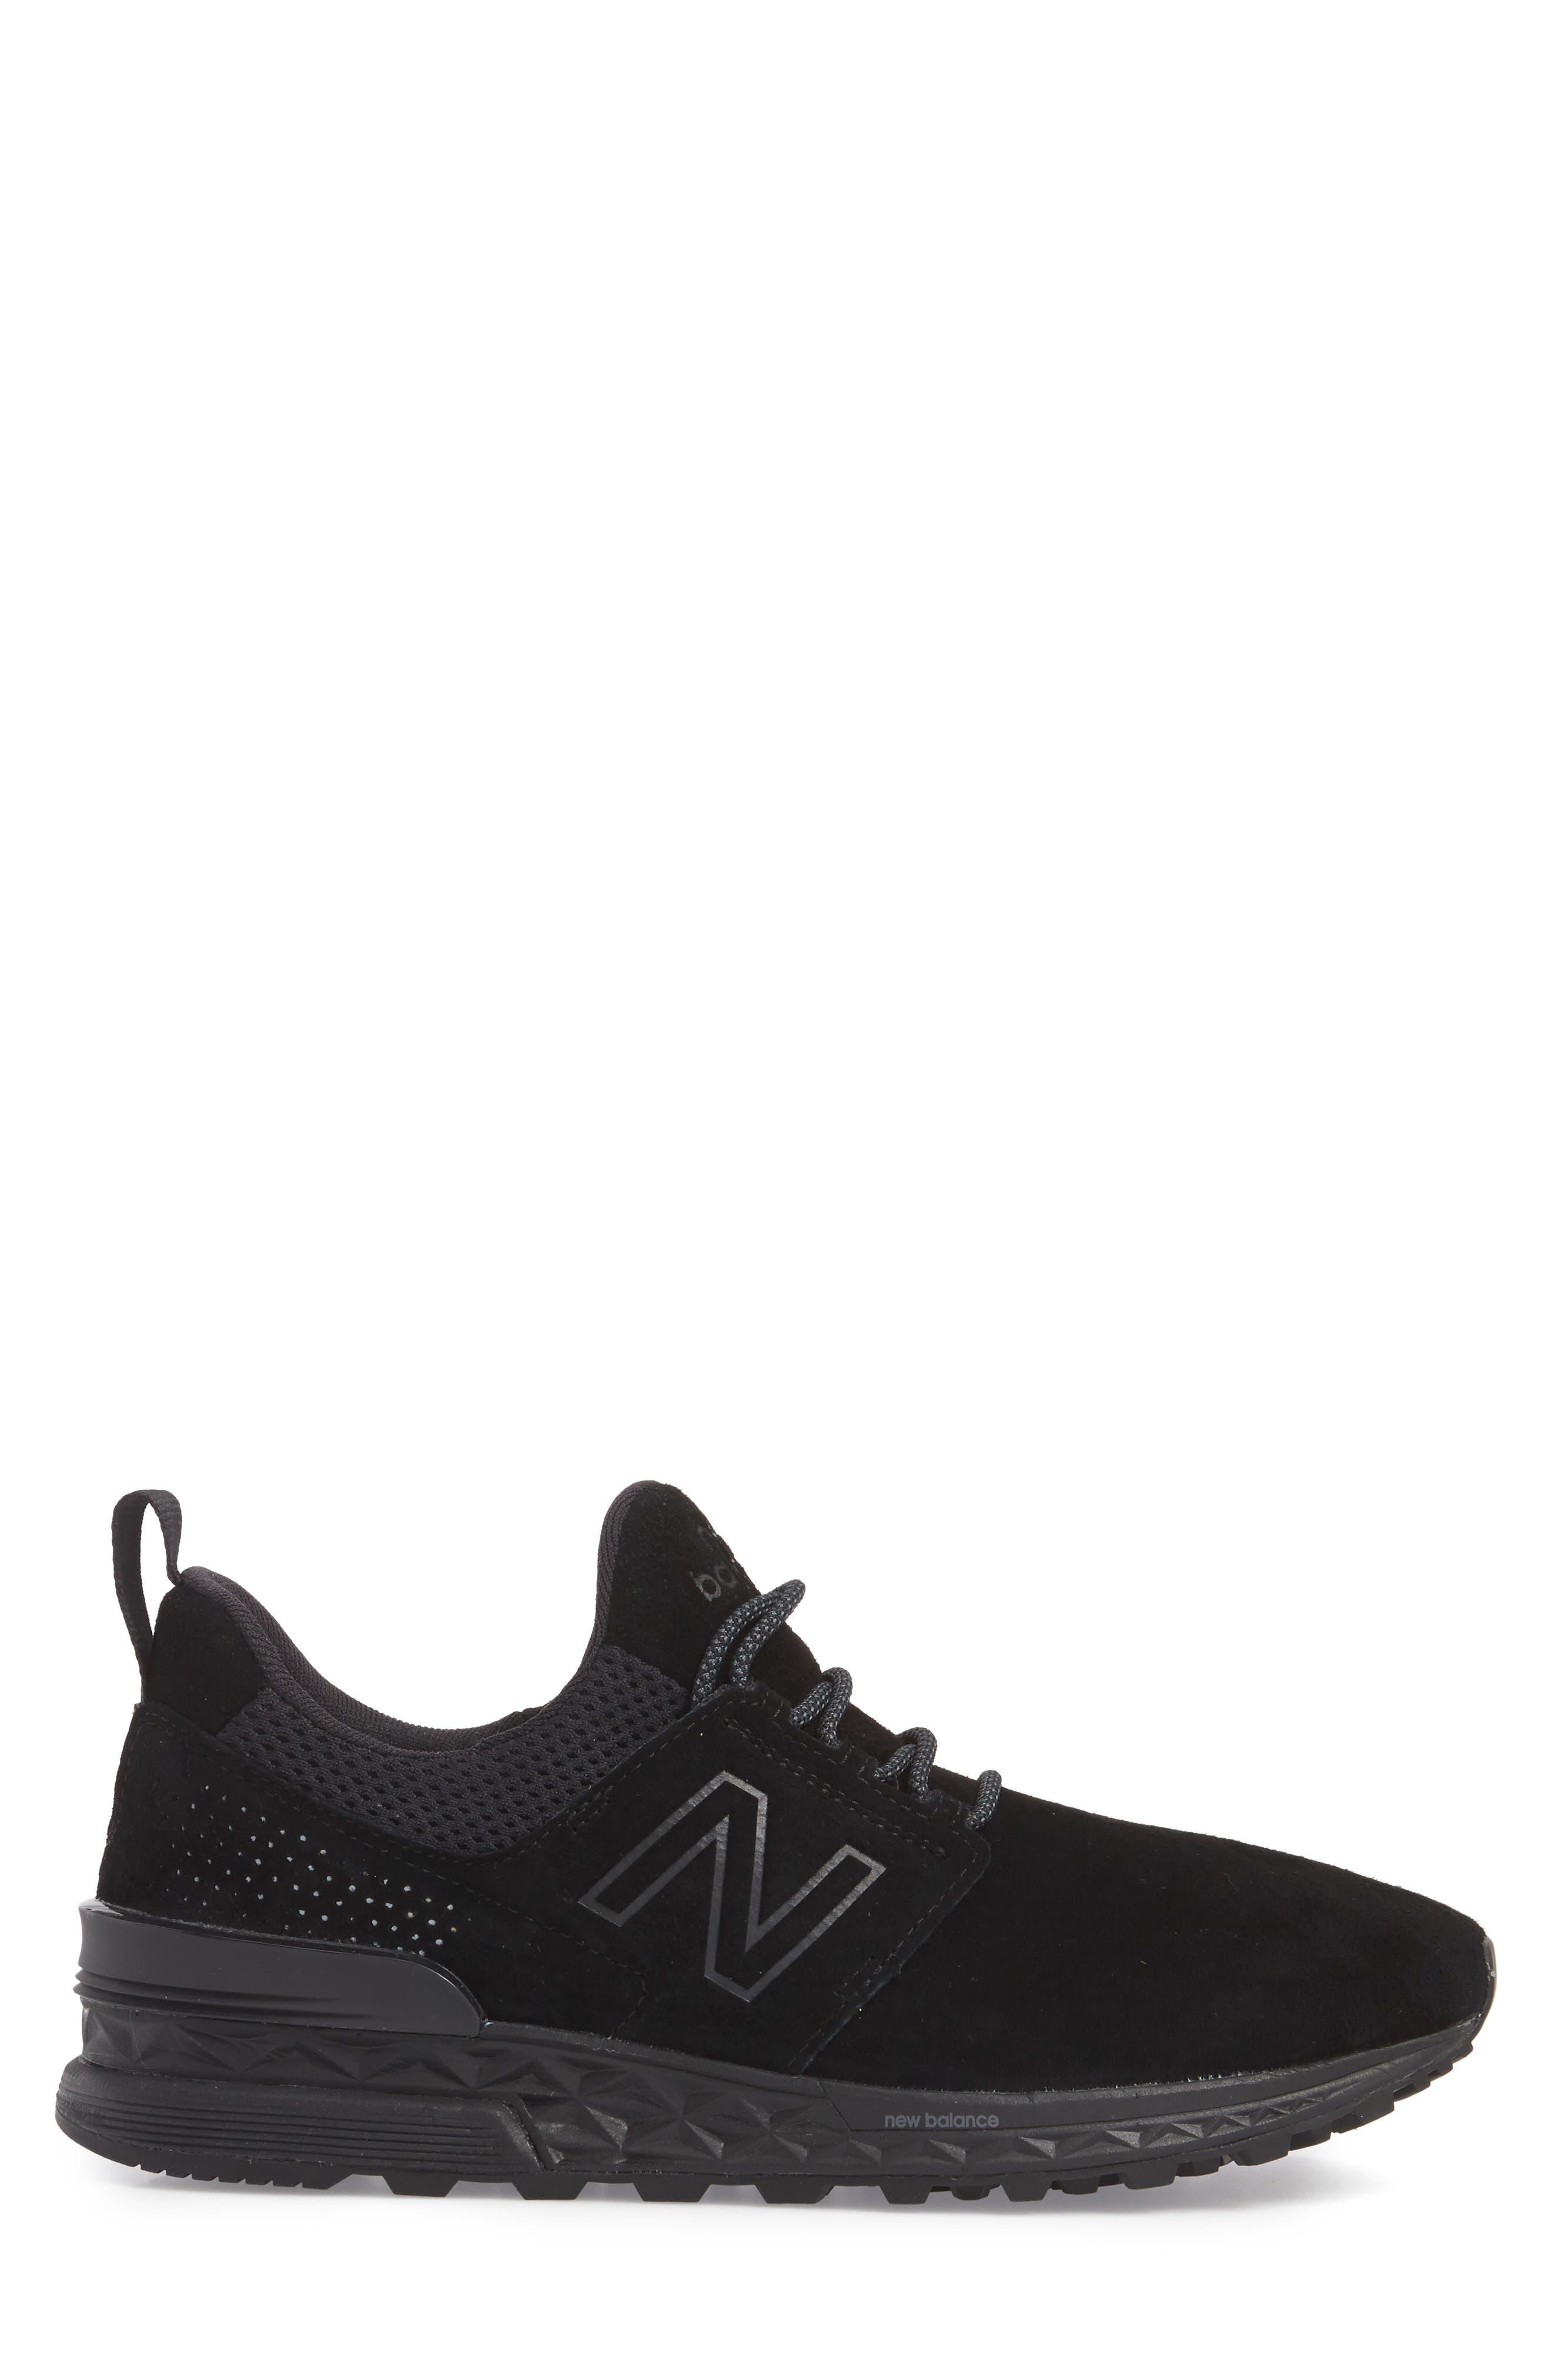 574 Decon Sneaker,                             Alternate thumbnail 3, color,                             001